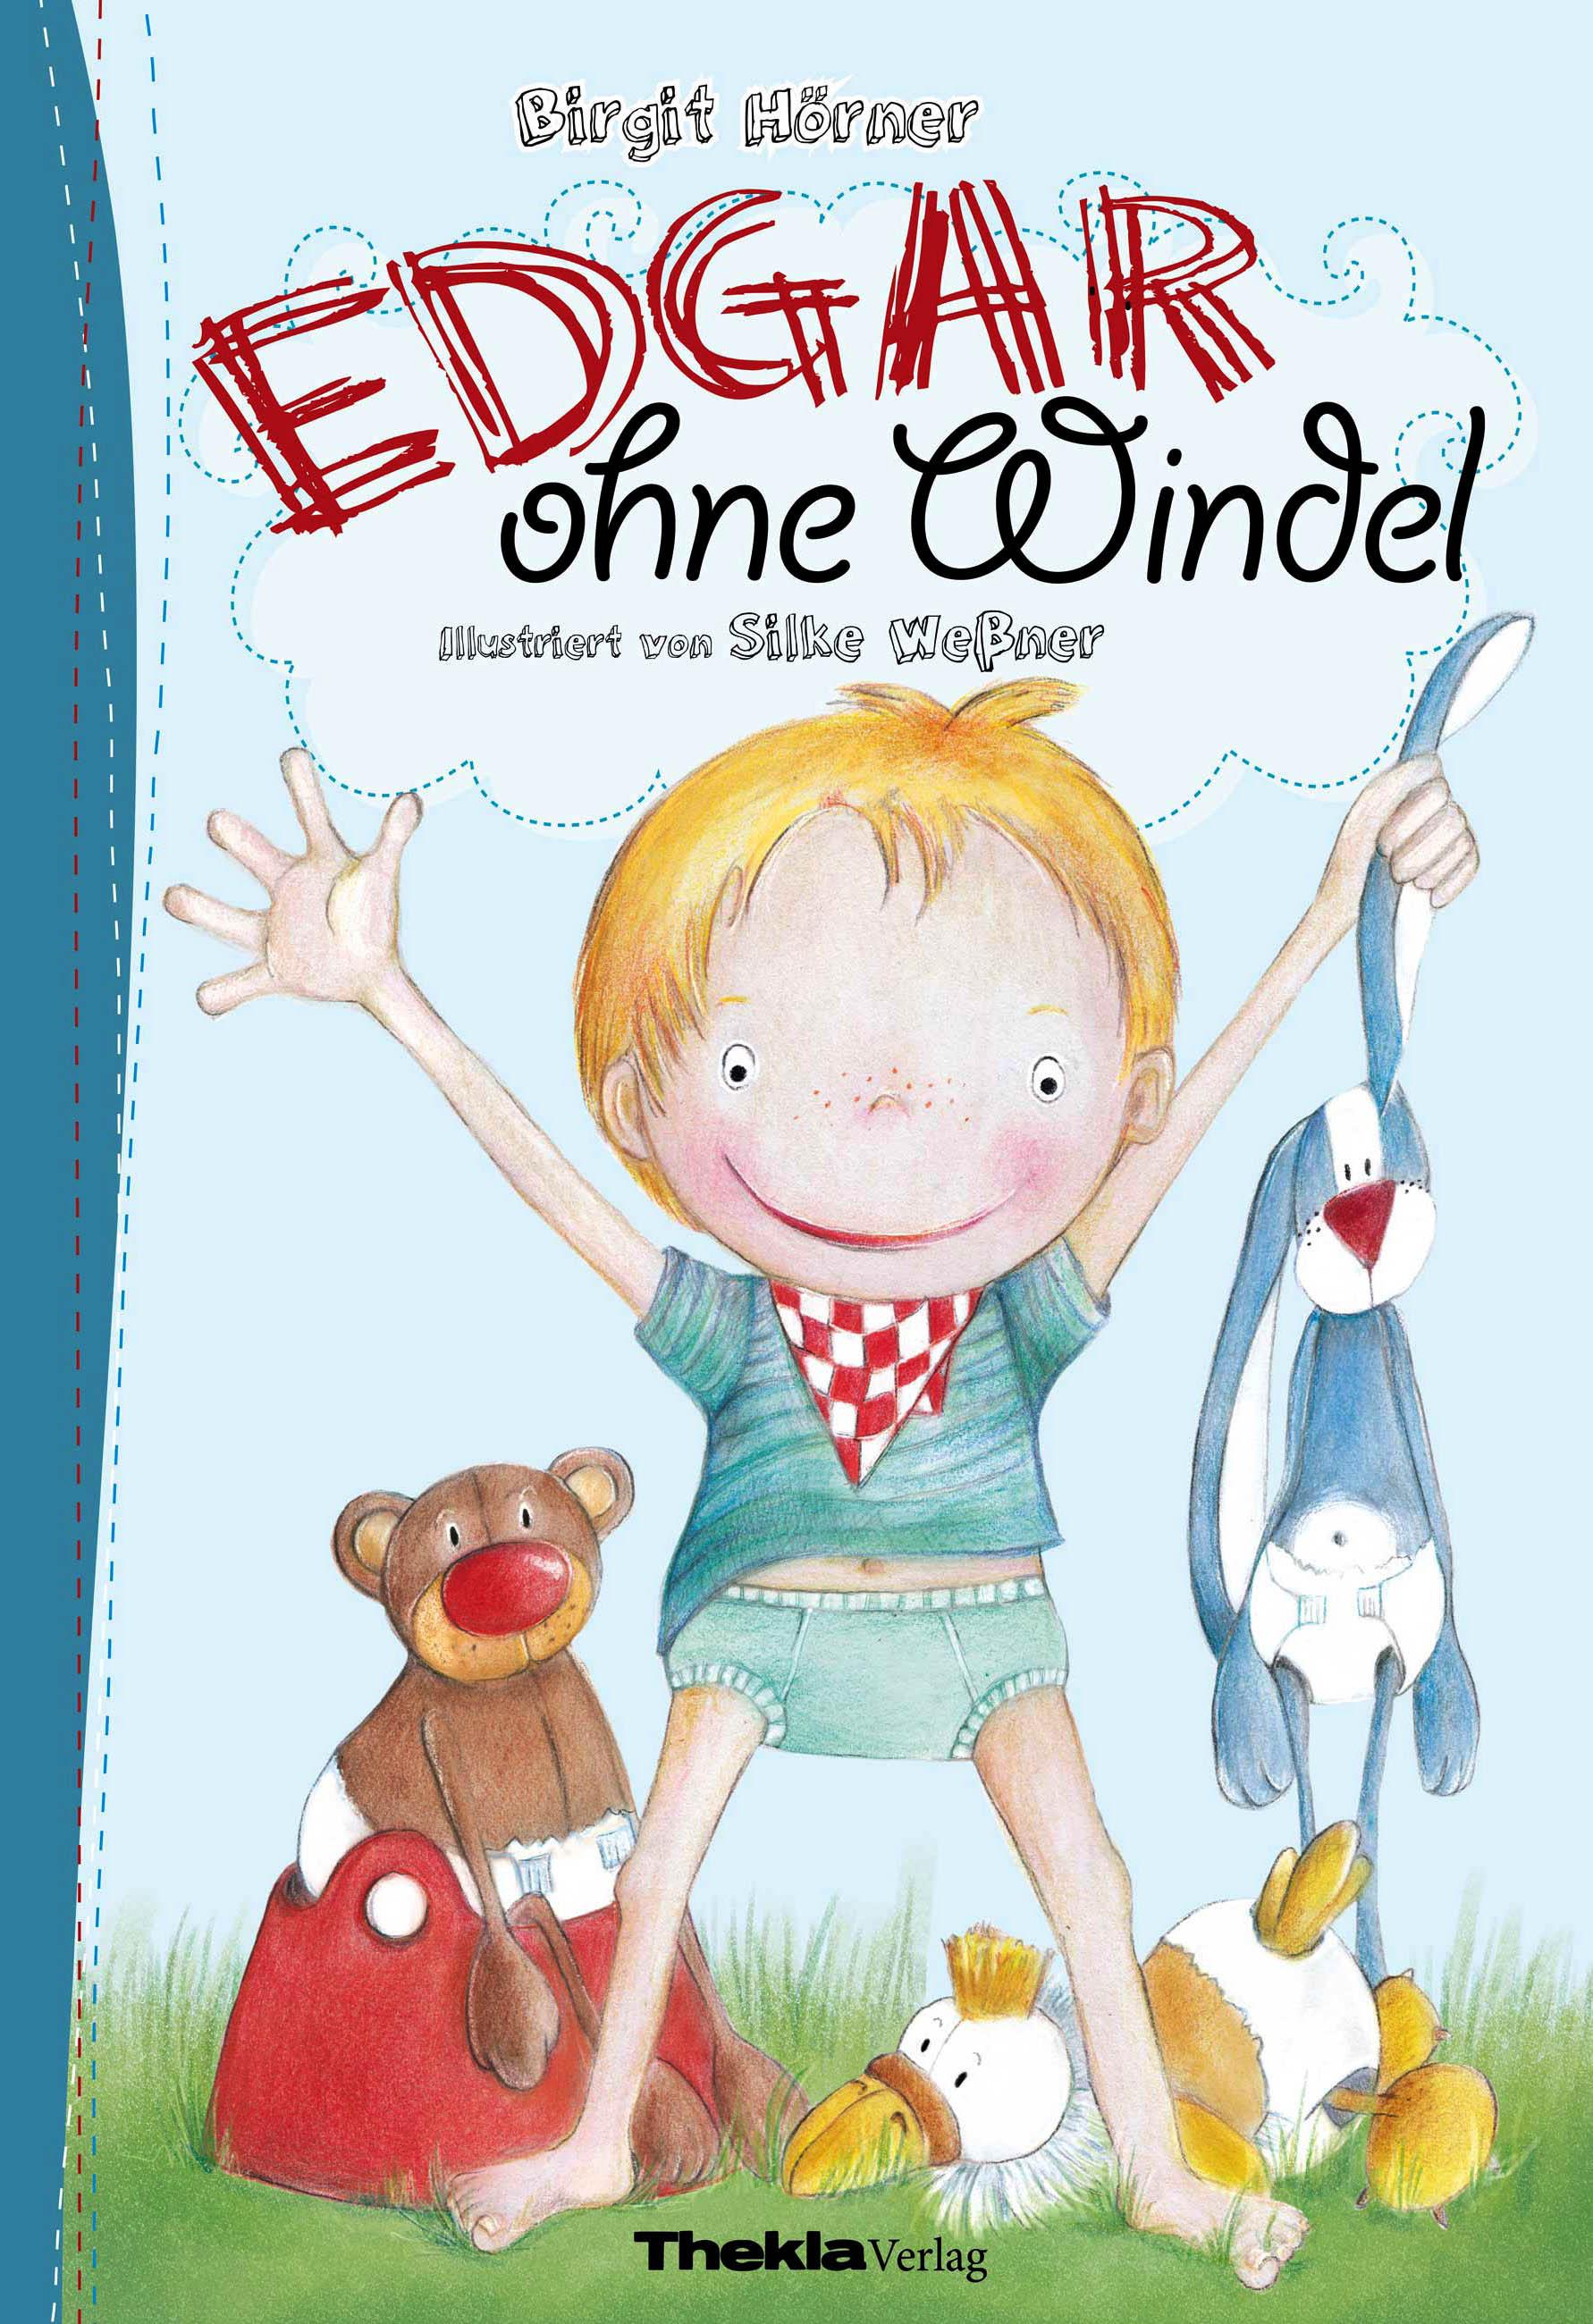 Edgar ohne Windel, Birgit Hörner